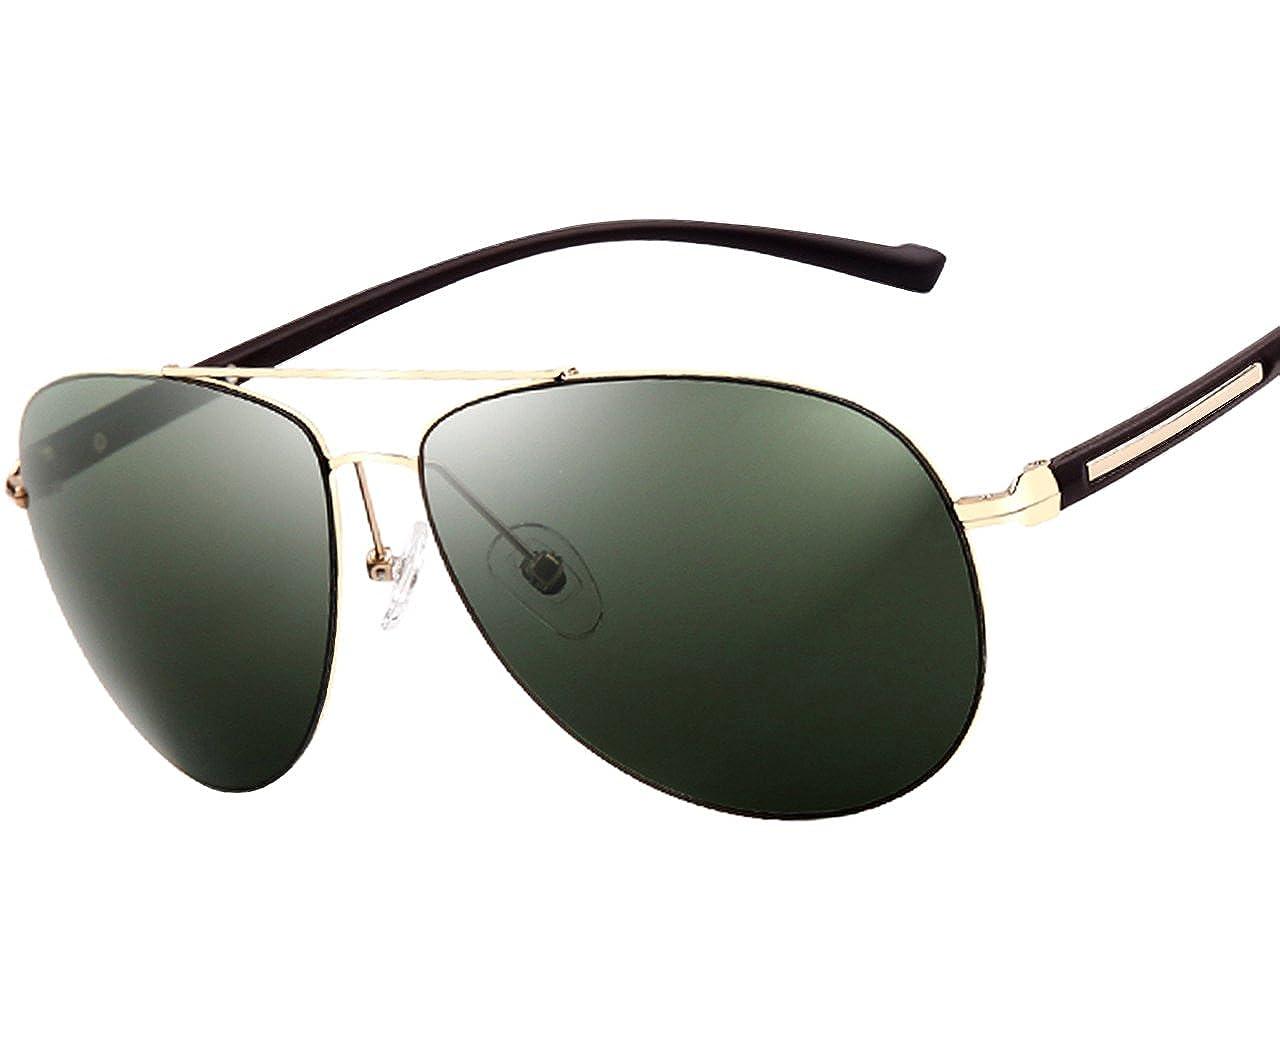 1c6420f85b ATTCL® 2015 Men Polarized Ultralight Sunglasses Uv400 Protection Aviator  Sunglasses 2362 Green  Amazon.co.uk  Clothing